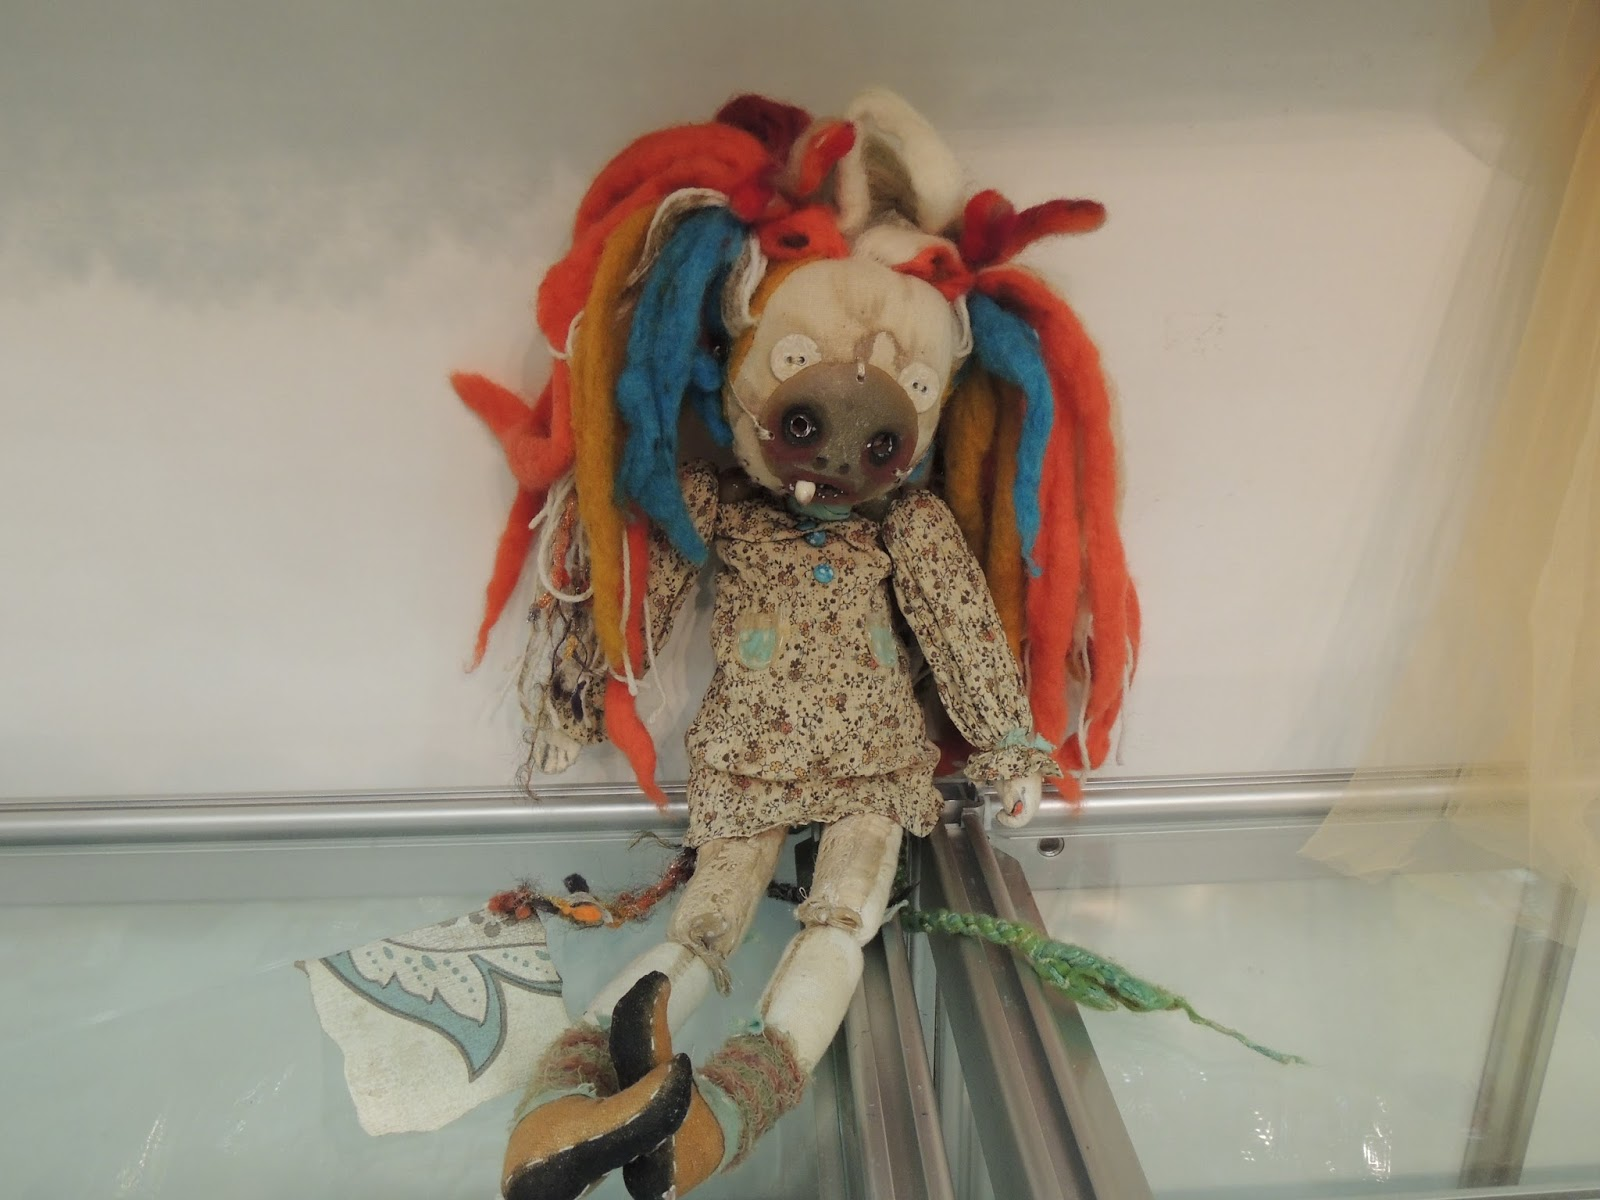 куклы,выставка,тишинка,салон,москва,чудики,страшилка